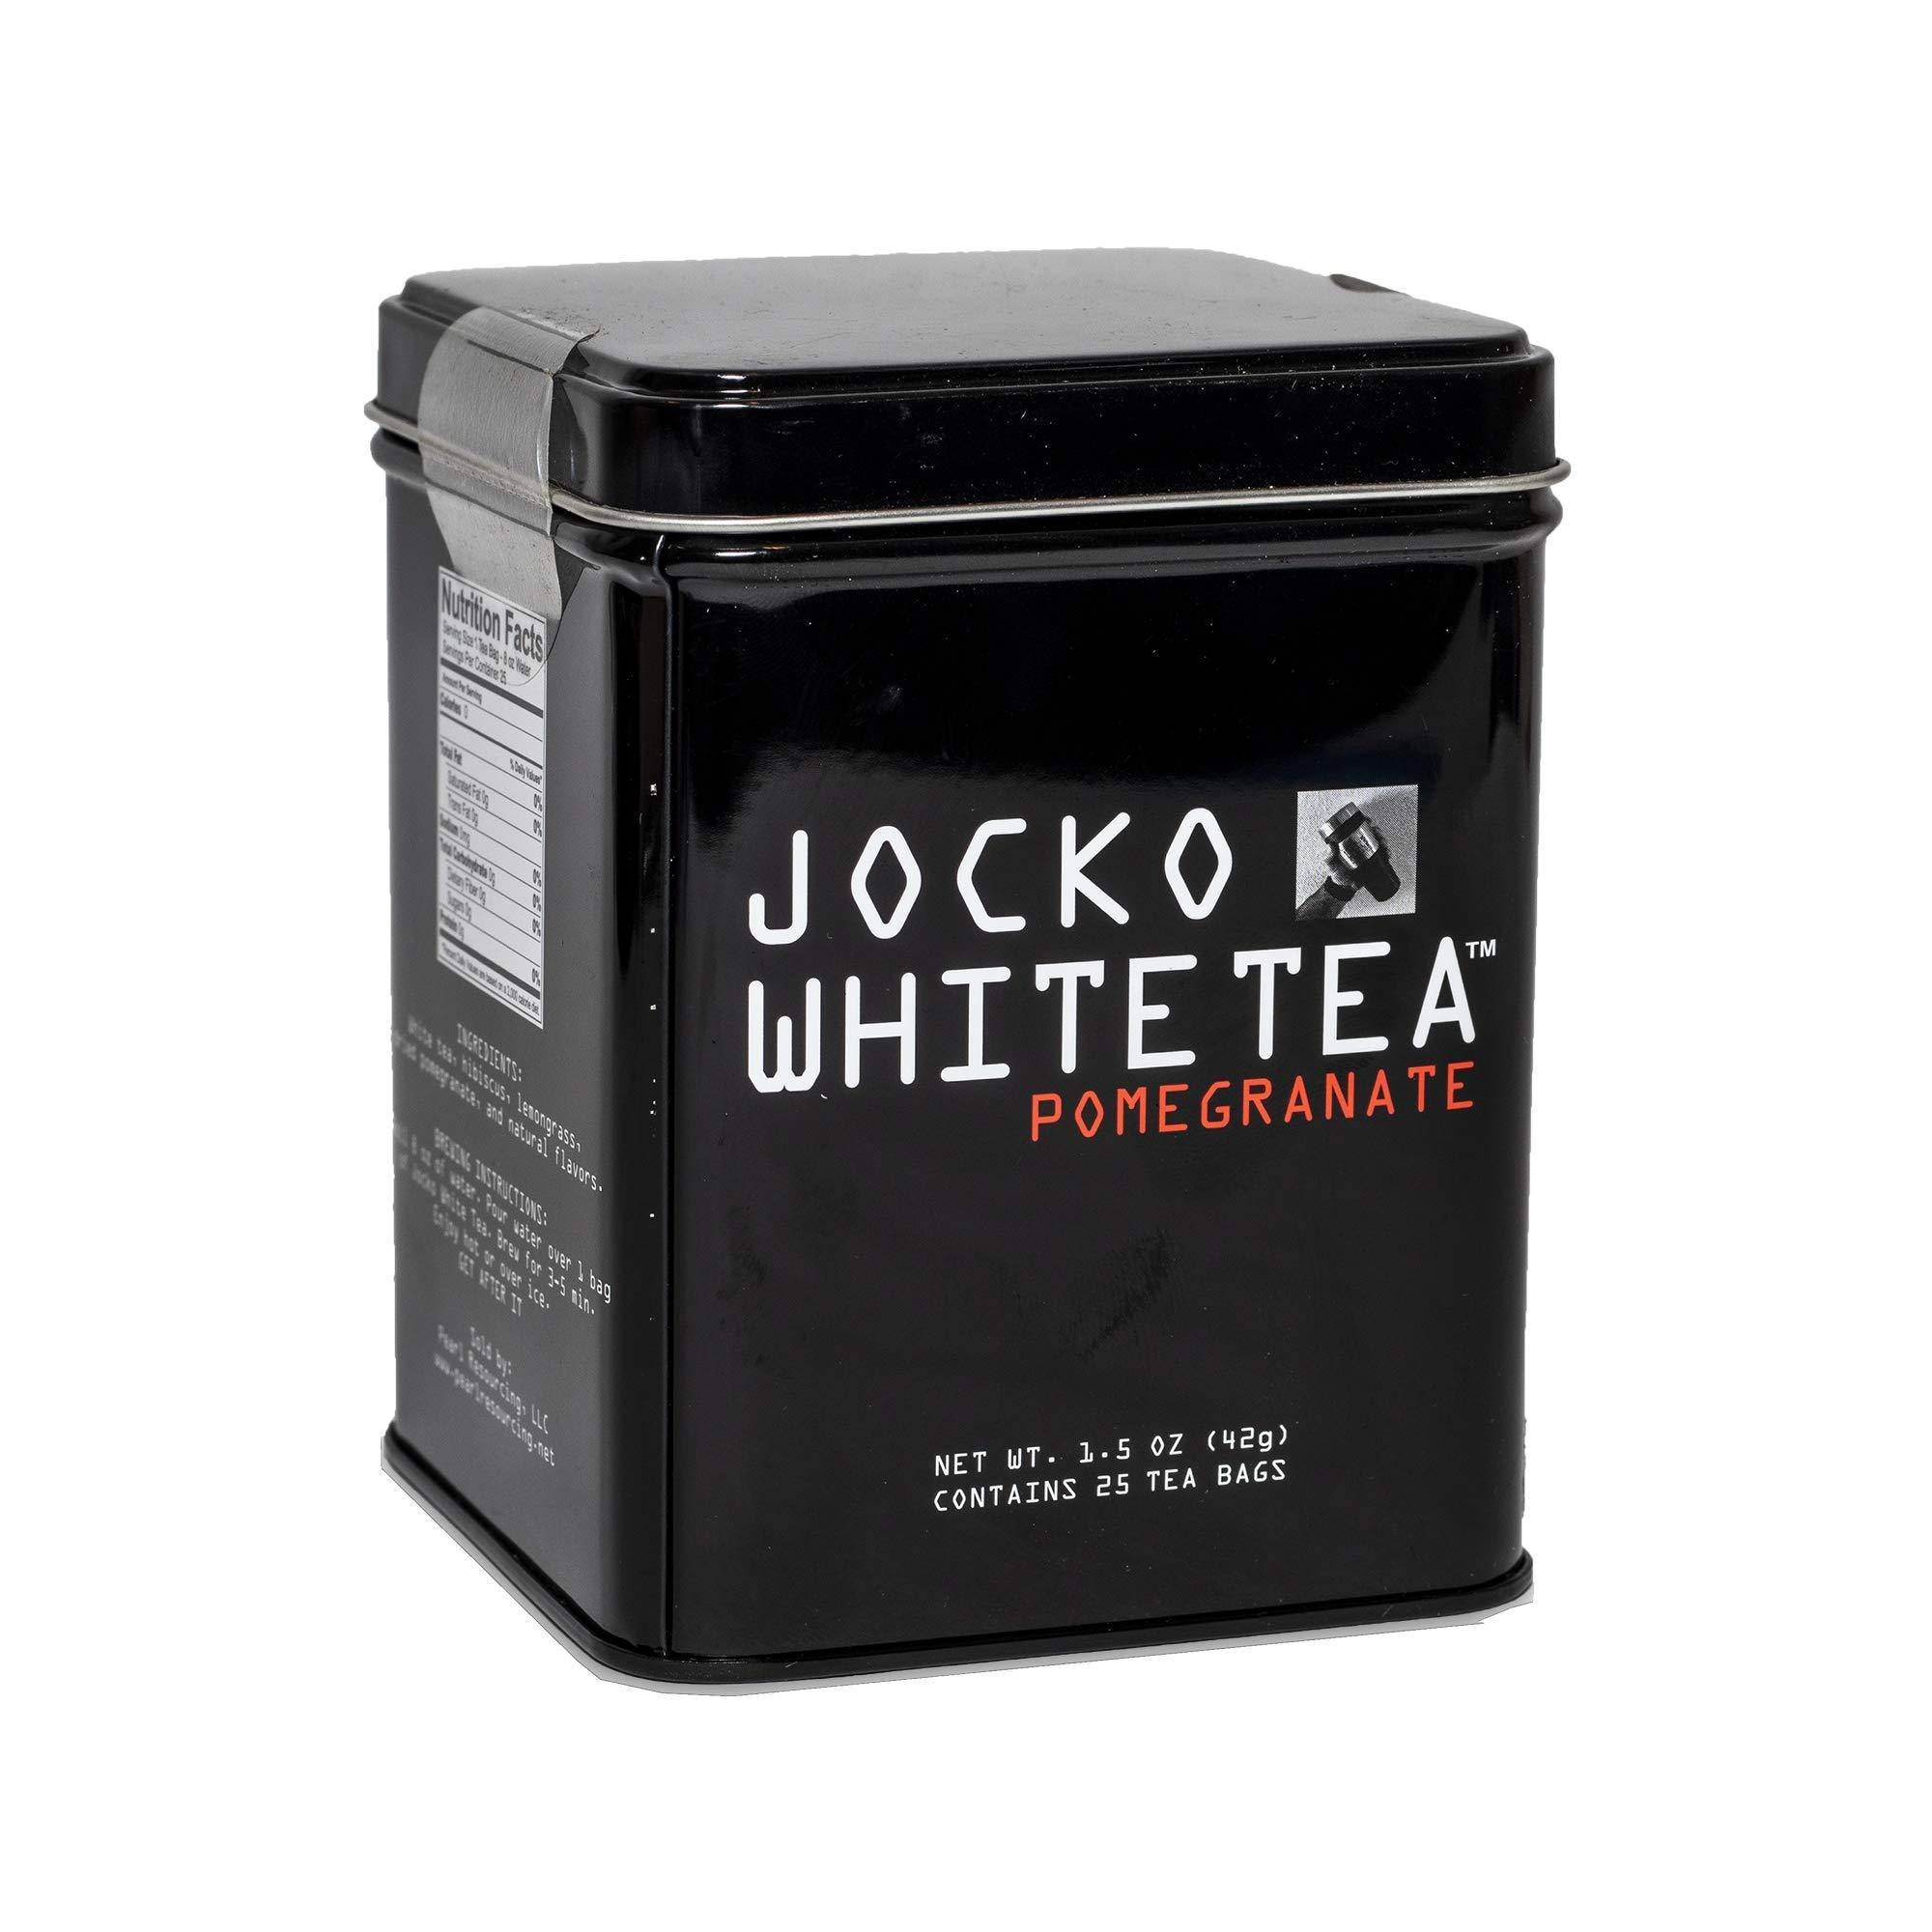 Jocko White Tea | Konnichi wa